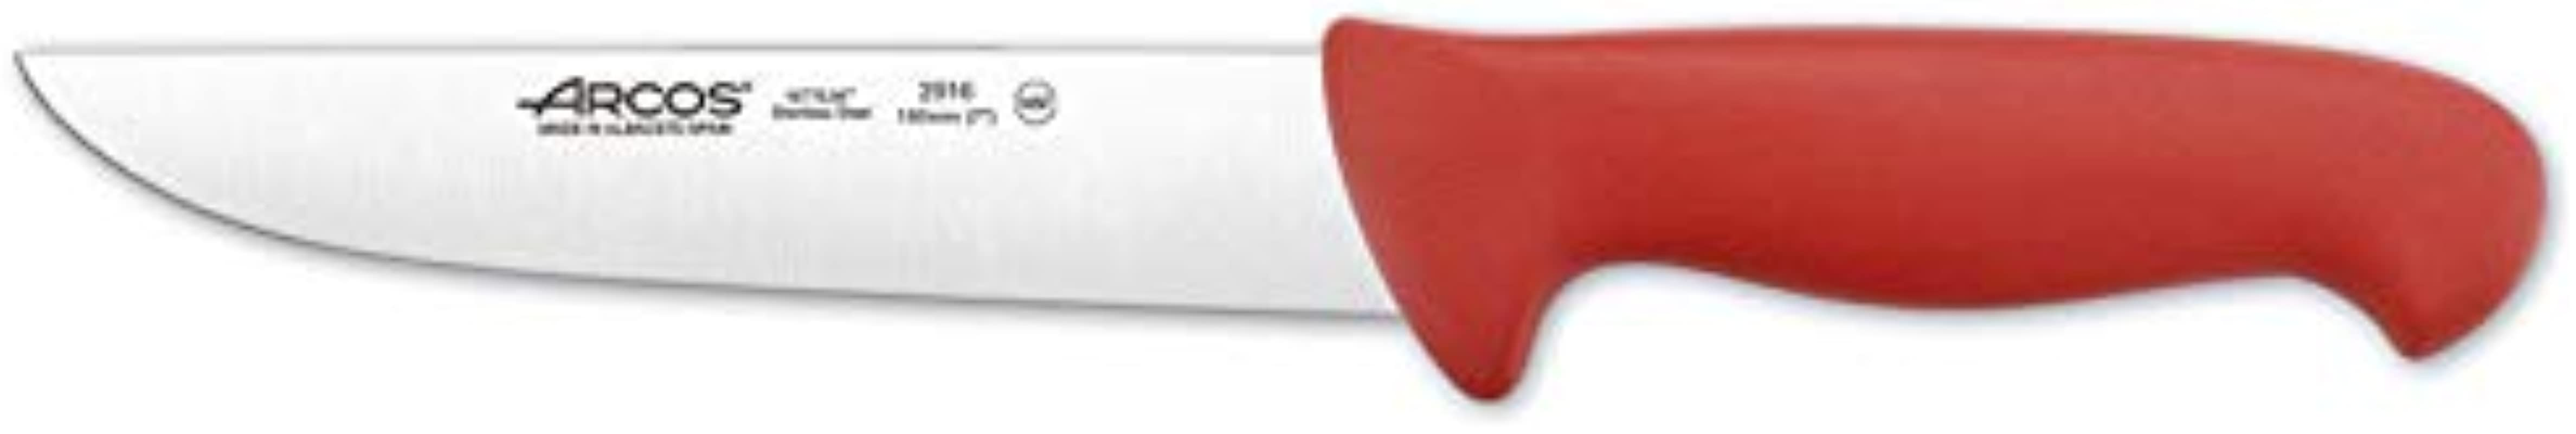 Arcos 7 Inch 180 Mm 2900 Range Butcher Knife Red